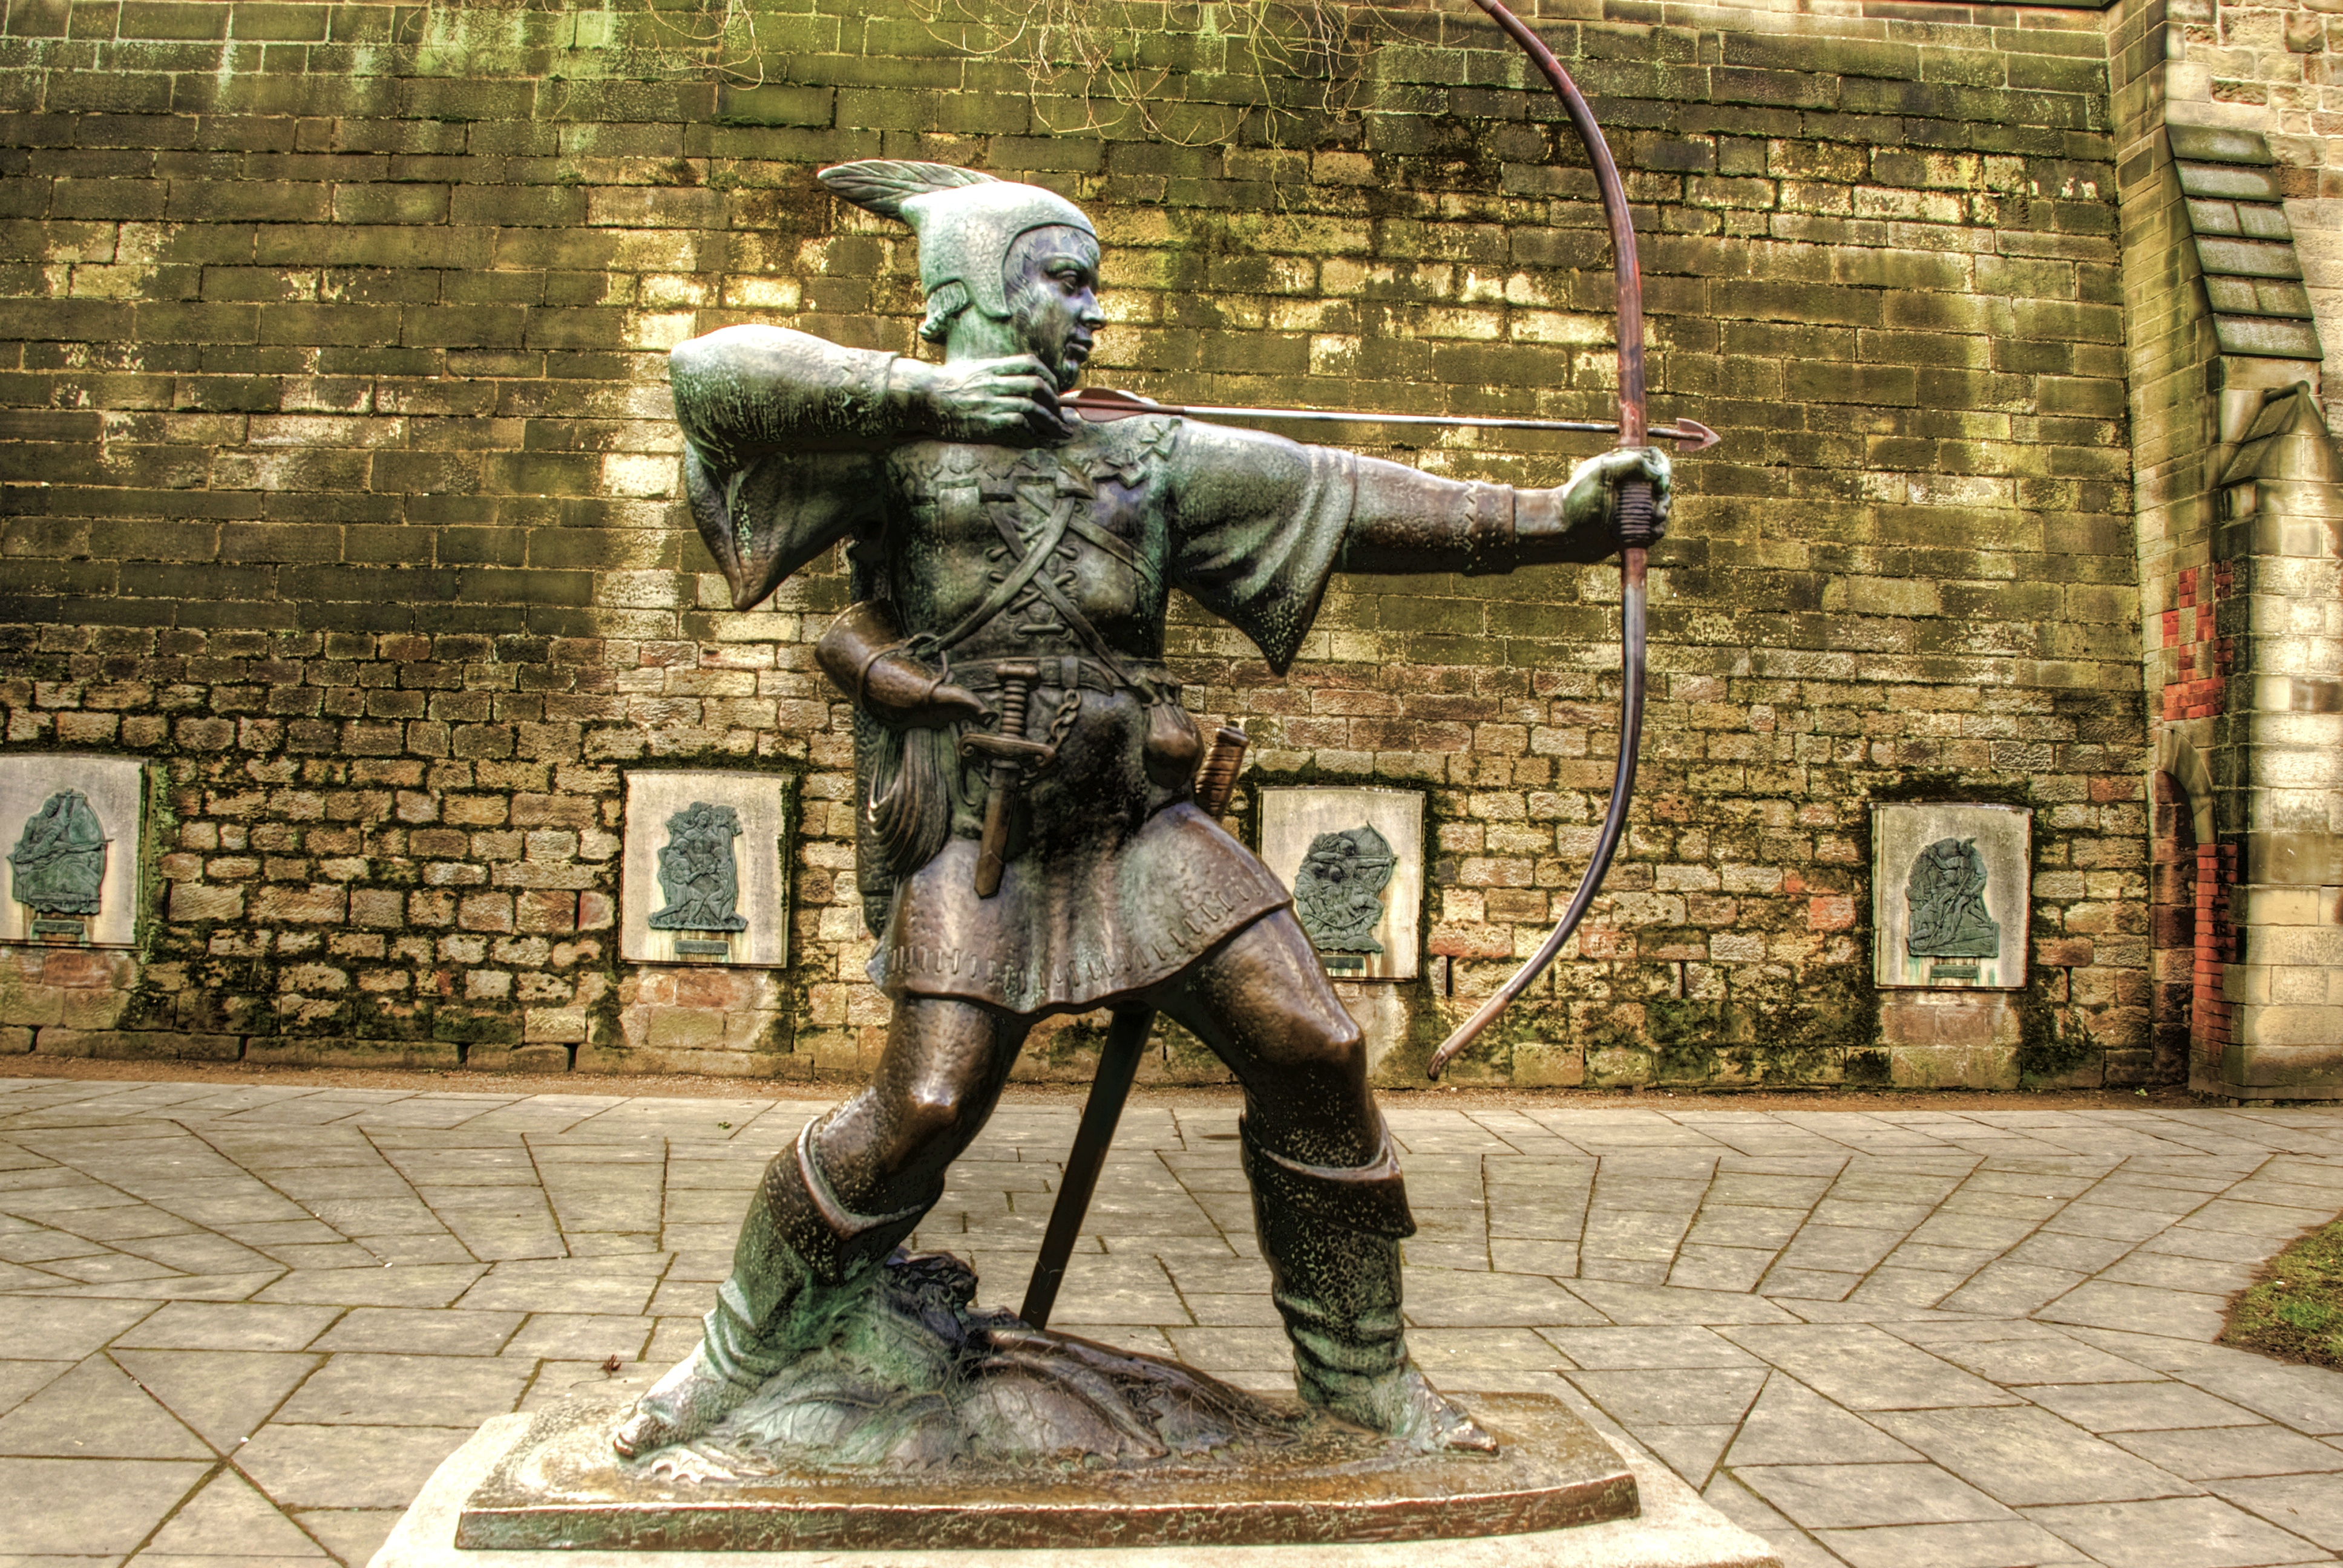 File:Robin Hood statue, Nottingham Castle, England-13March2010.jpg -  Wikimedia Commons